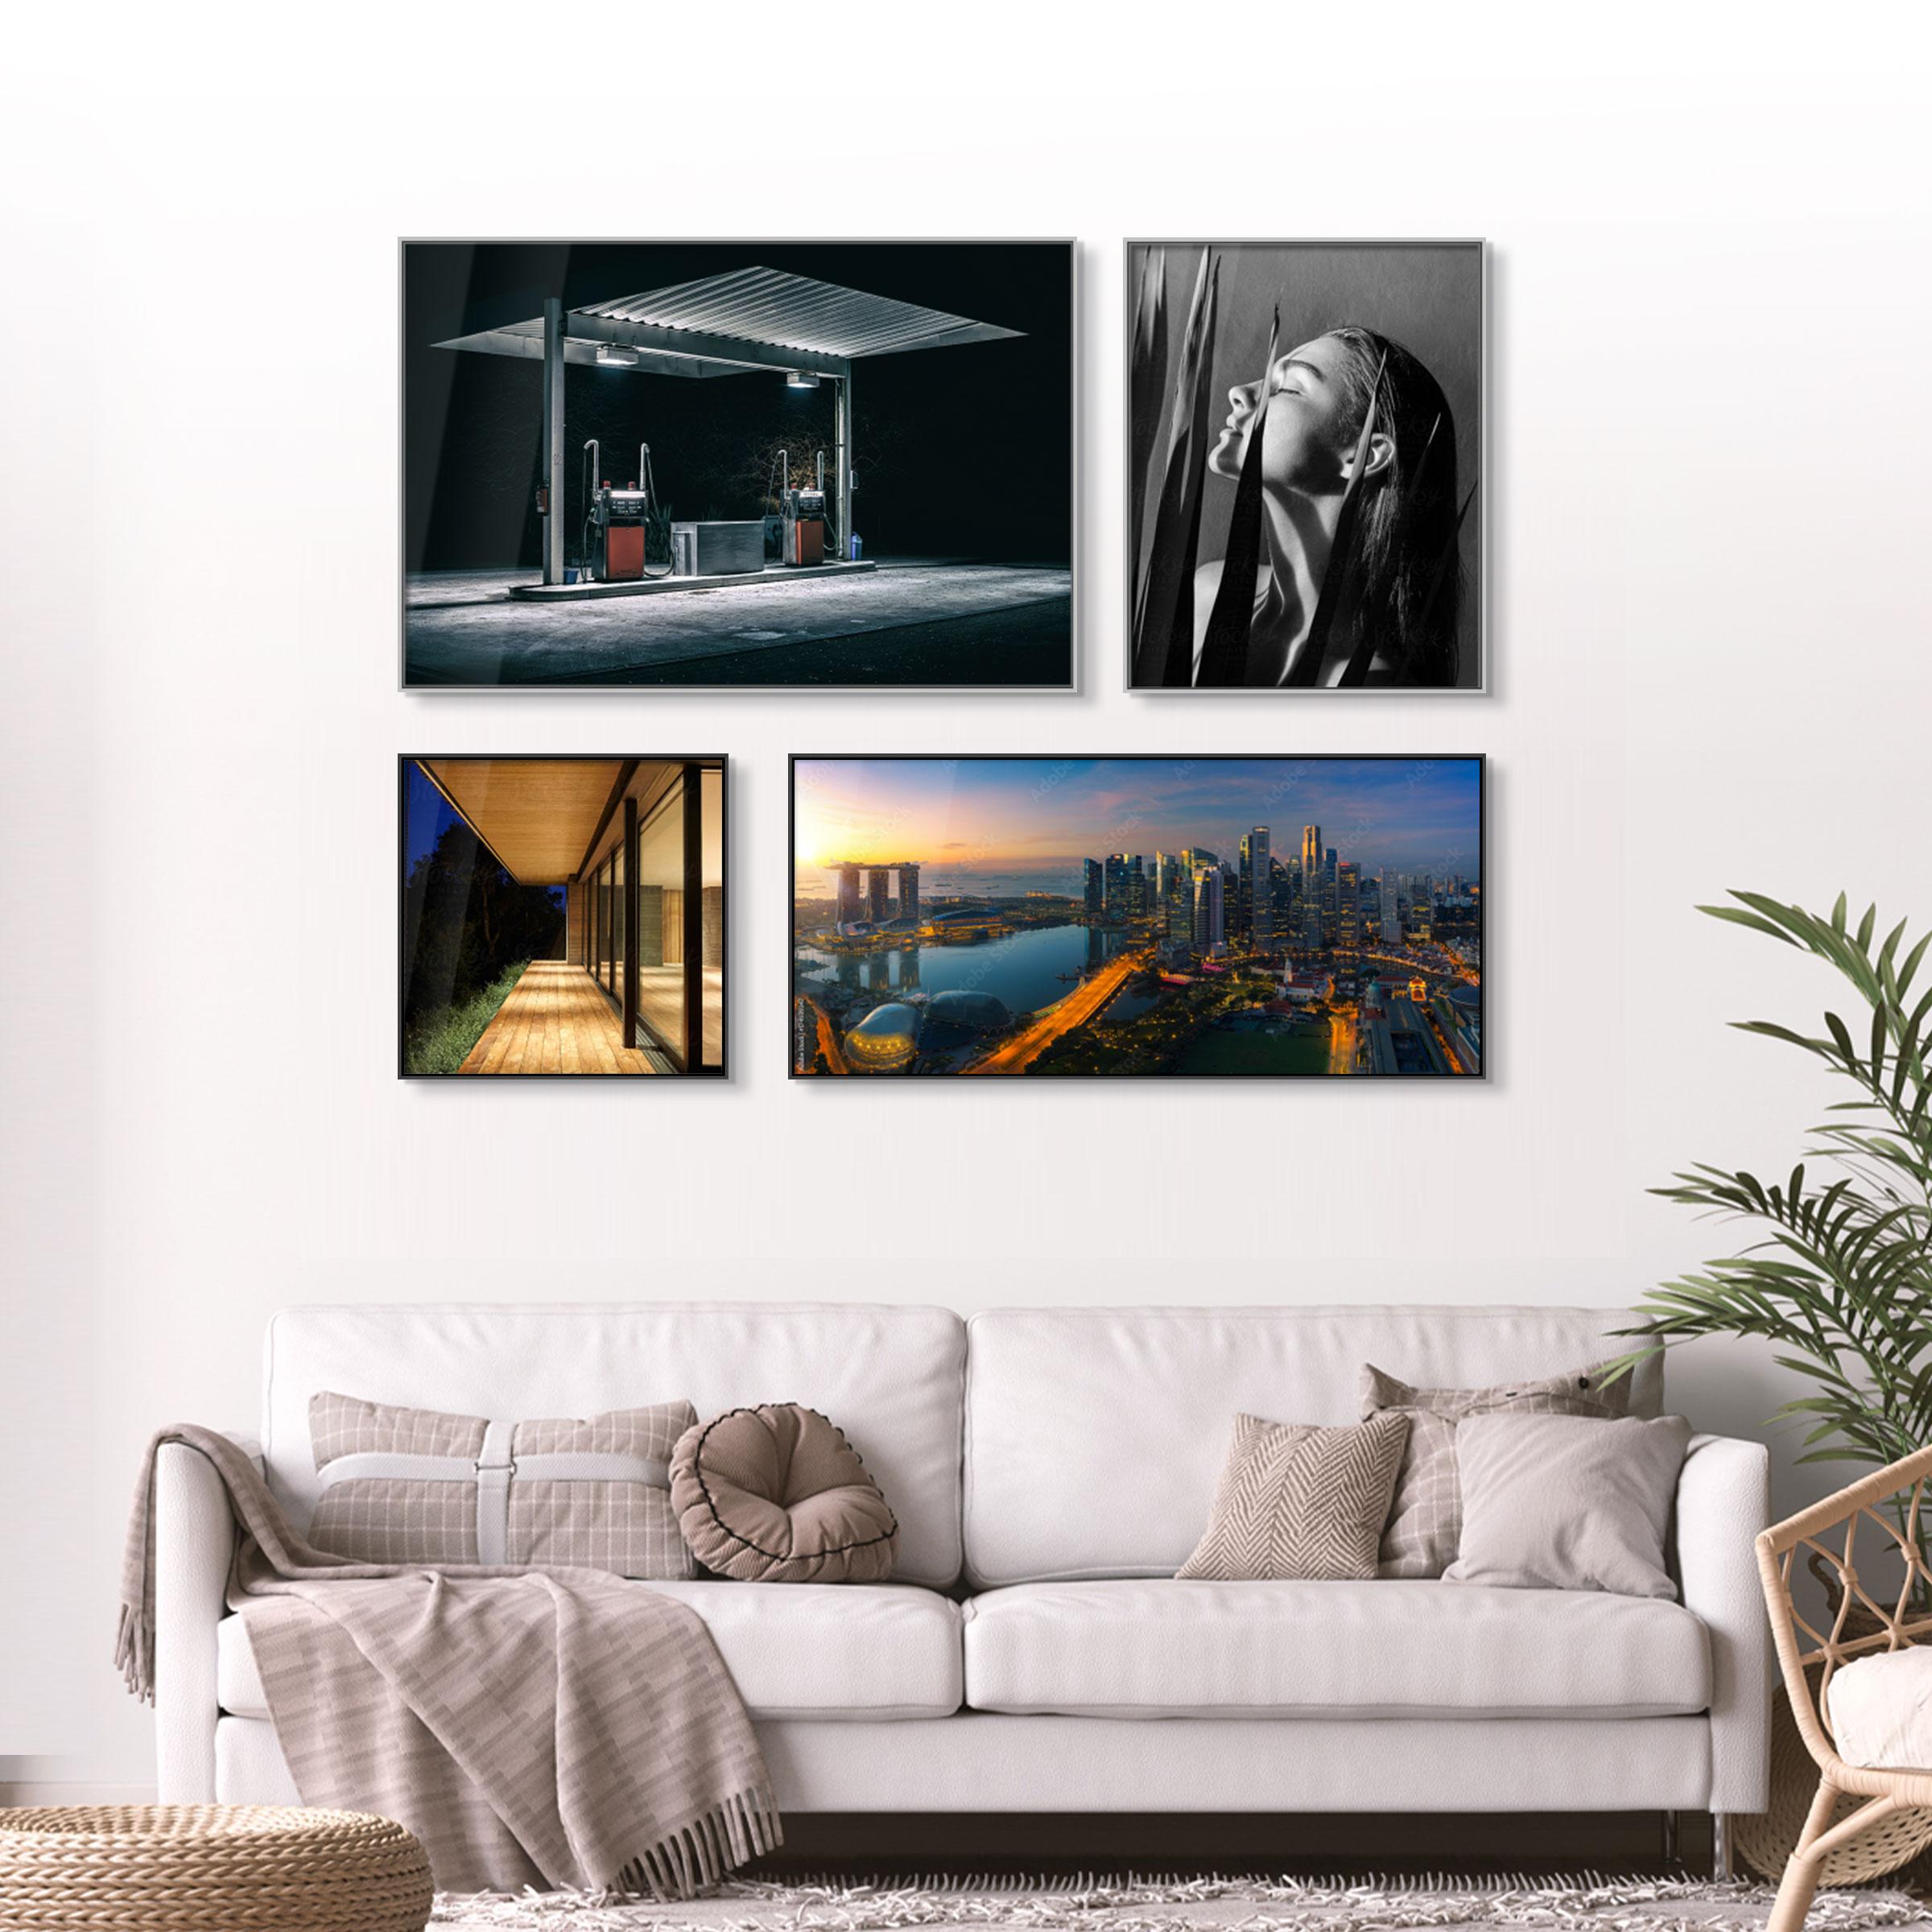 artbox-aluminium-architektur-inspiration-1200x1200.jpg